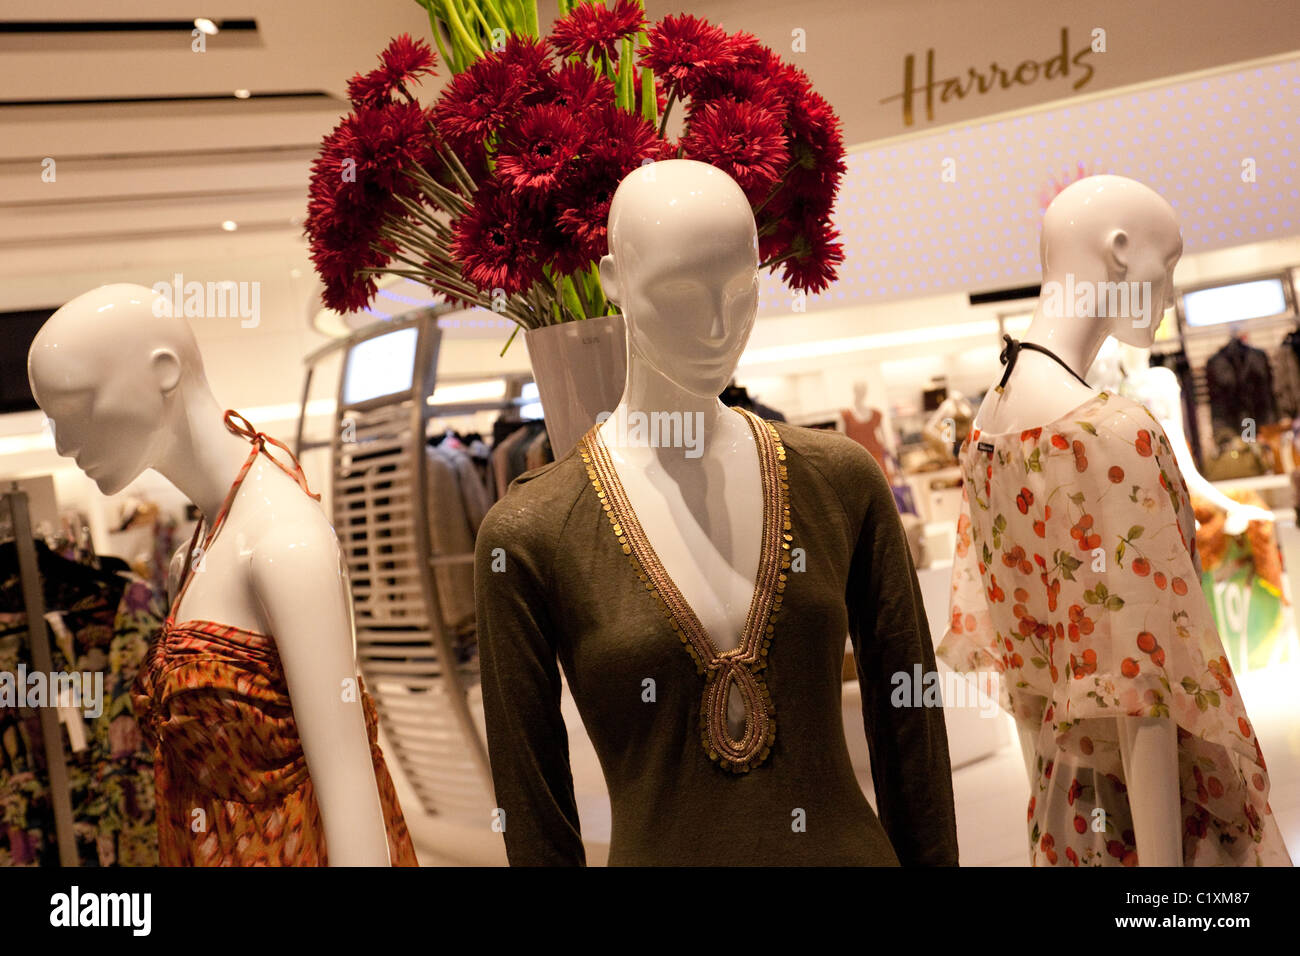 The harrods store at terminal 5, Heathrow airport, London UK - Stock Image